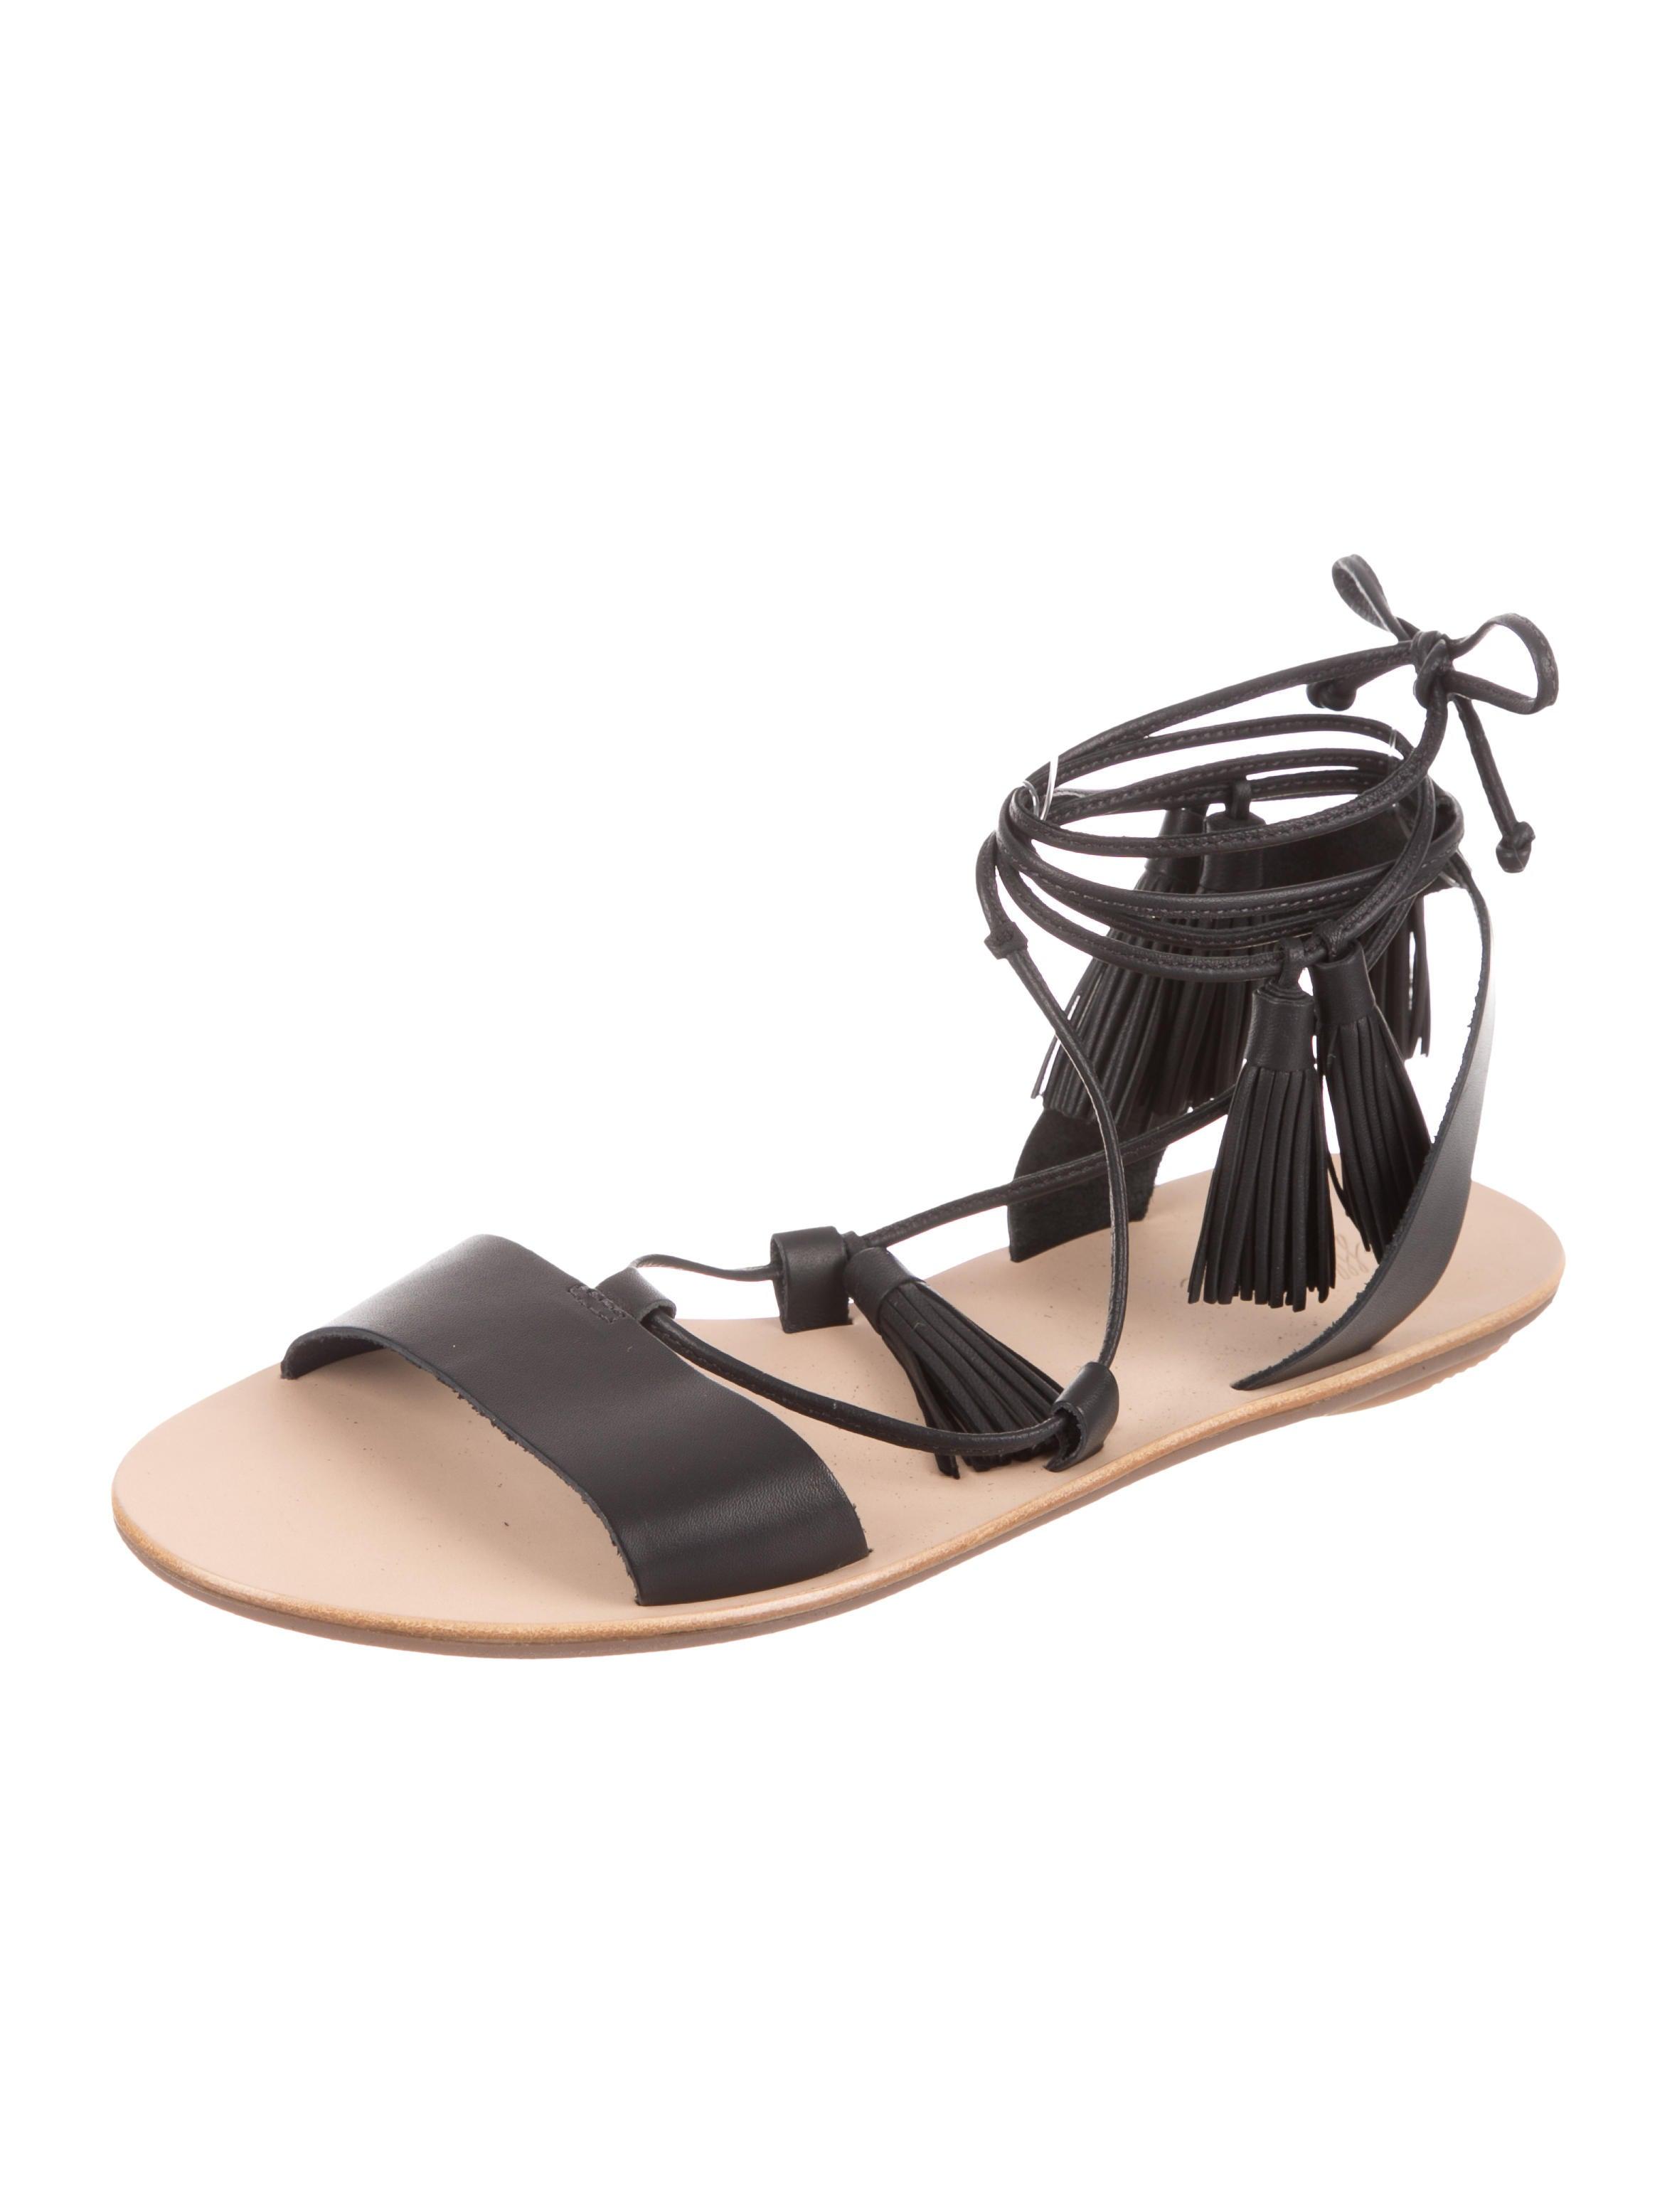 Loeffler Randall Saffron Wrap-Around Sandals w/ Tags visit online outlet professional clearance pick a best wY9qiz9C